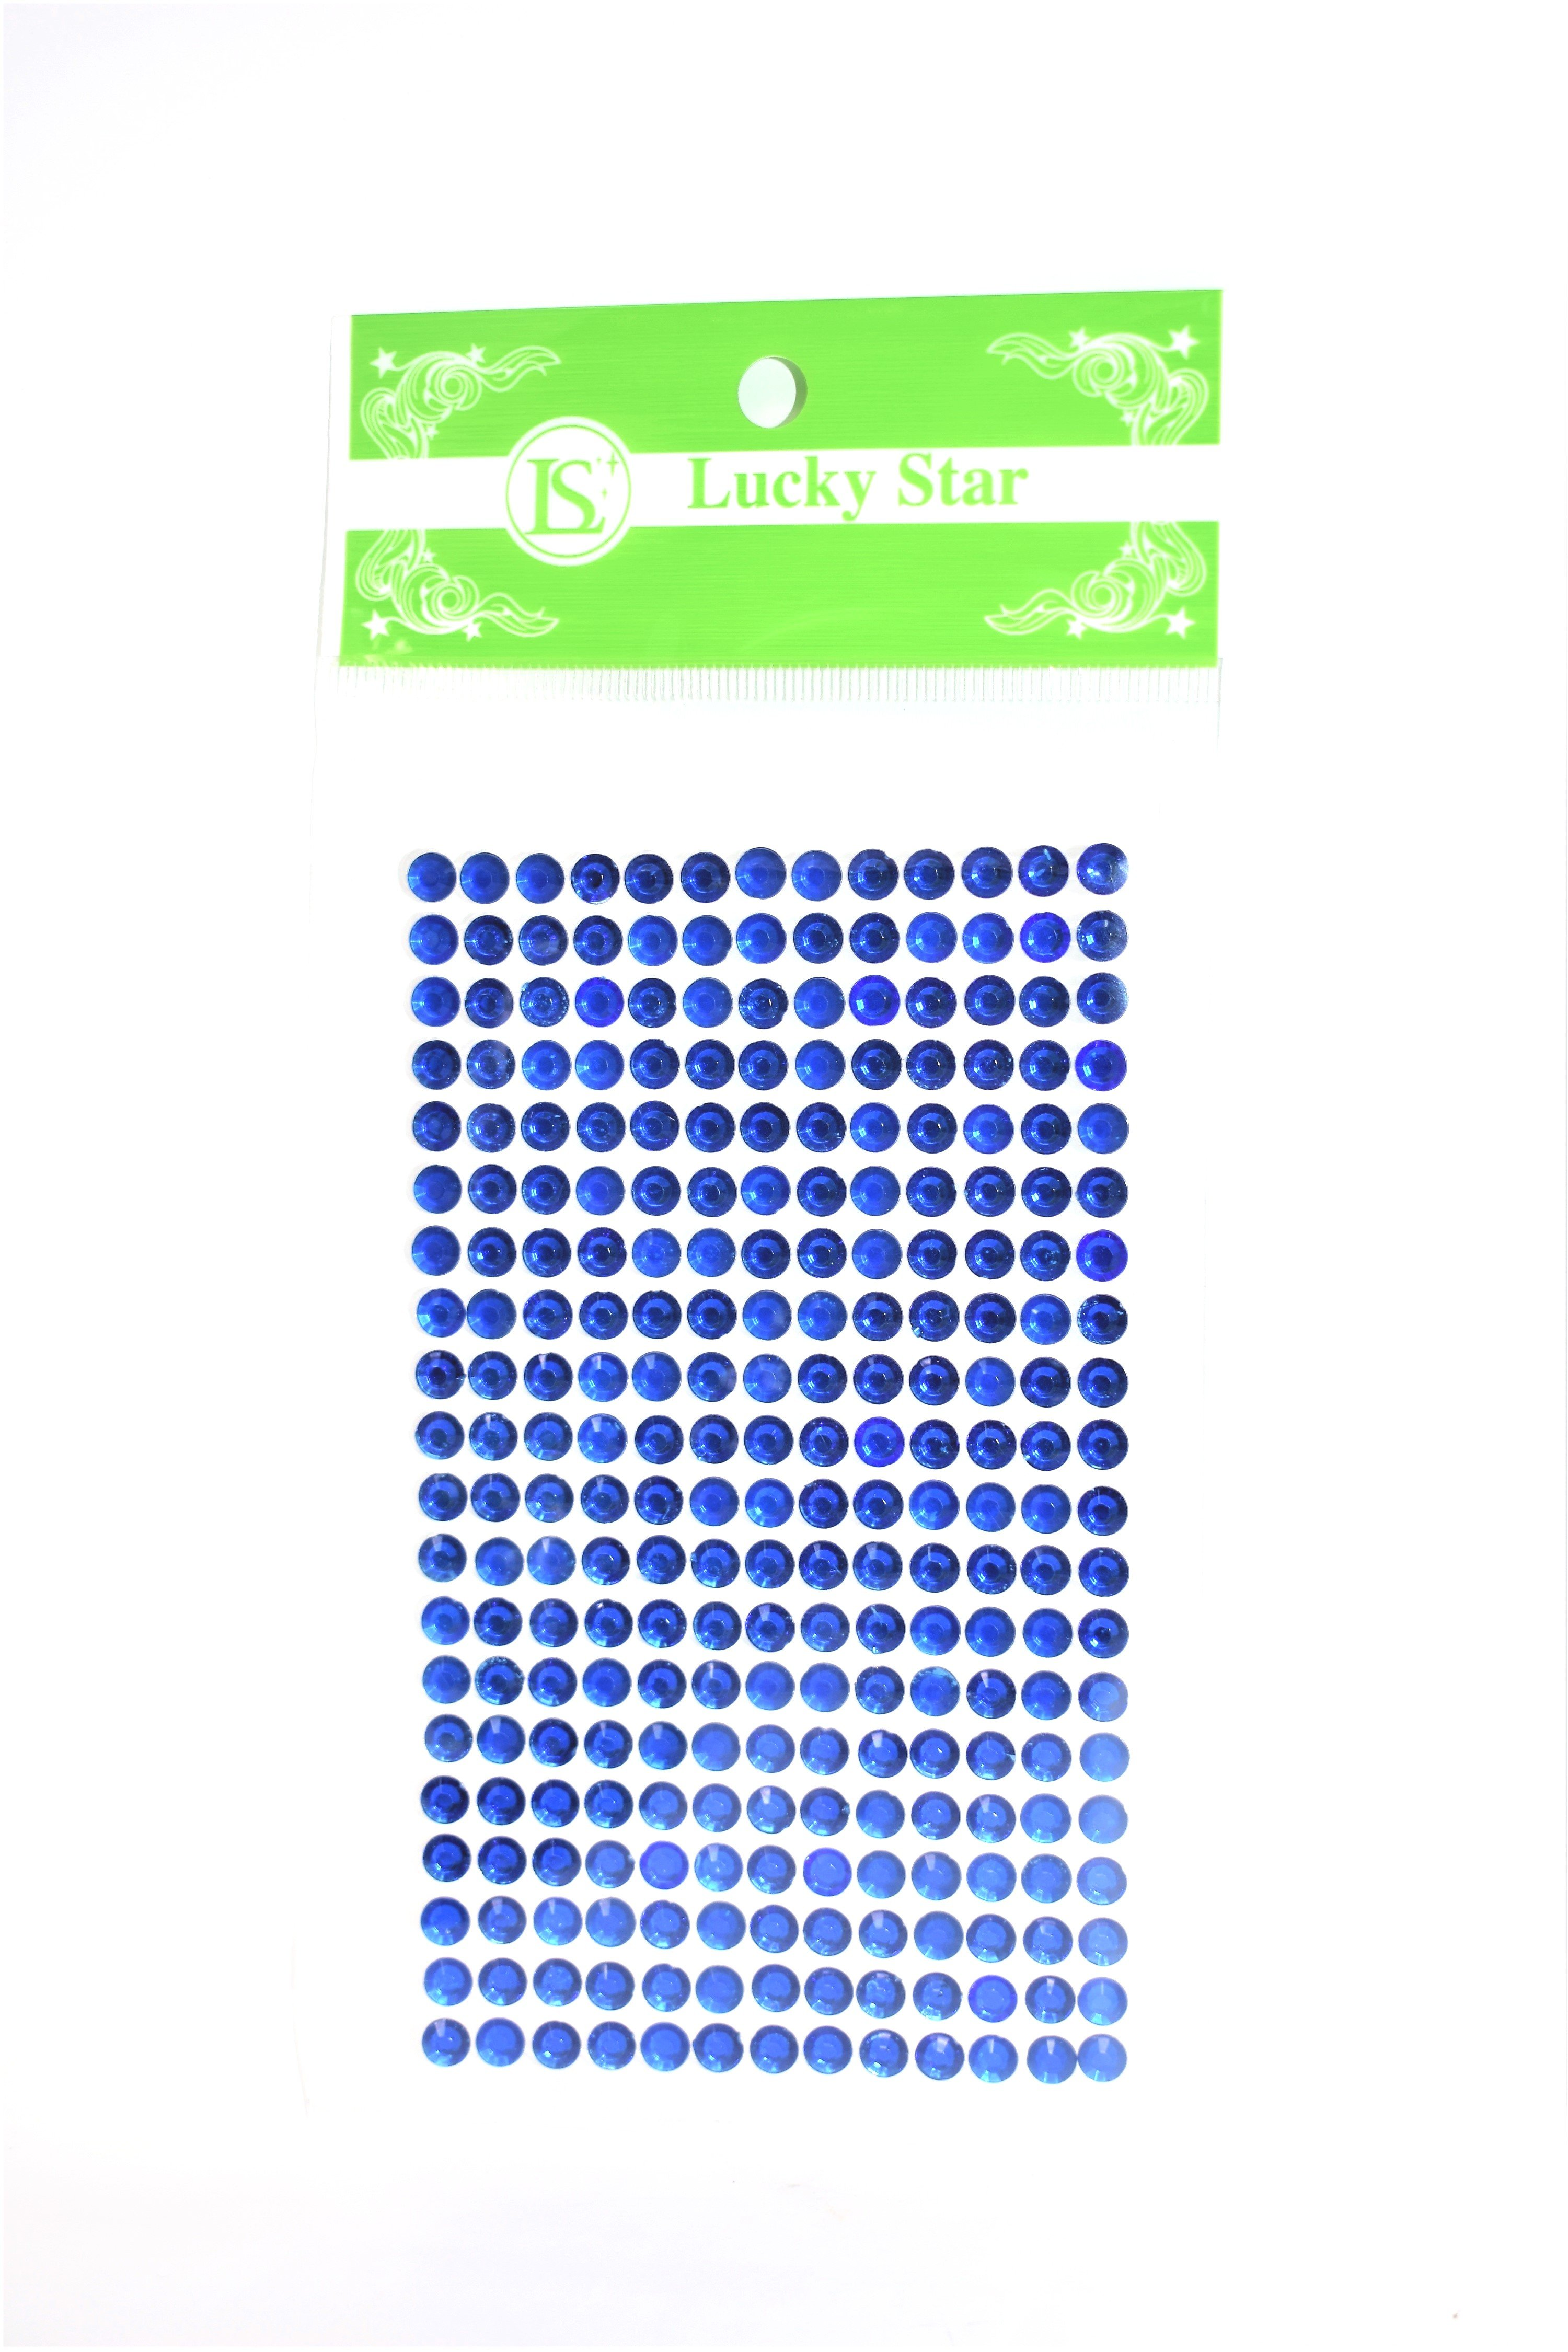 9ee360c253 Acrylic Circle Rhinestone Stickers, Royal Blue Color, 20 Strips x 13 ...